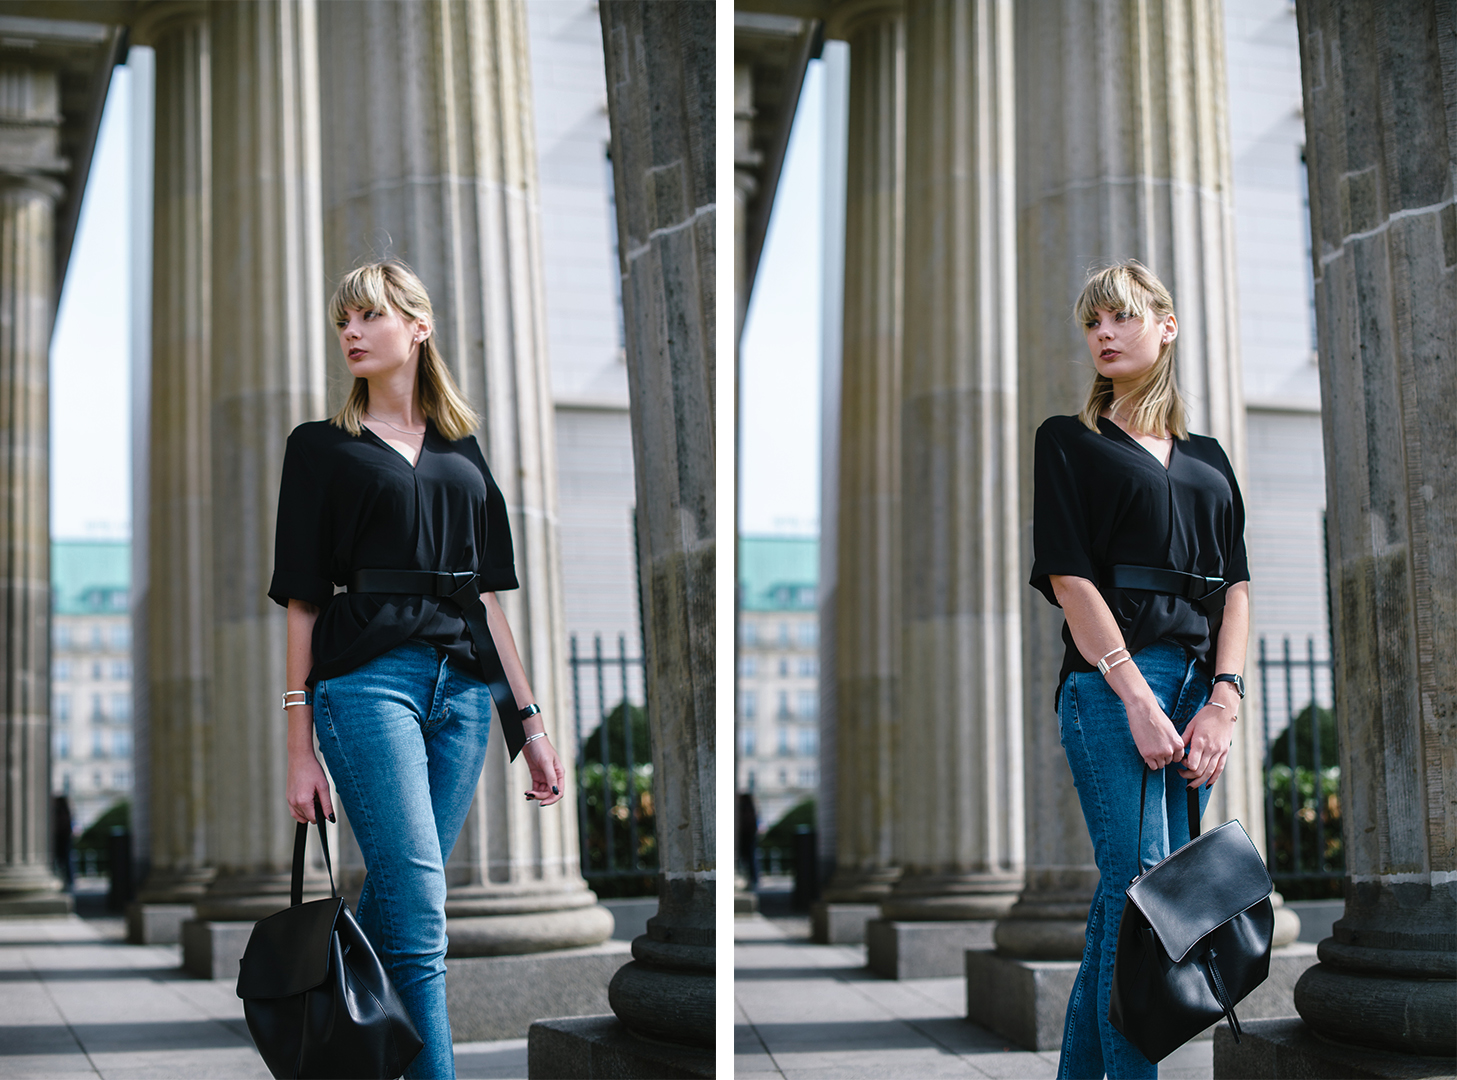 Andrea Puccini Pumps_Frühsommeroutfit_Brandenburgertor_Berlin_Kiamisu_Modeblog_Fashionblog-final1